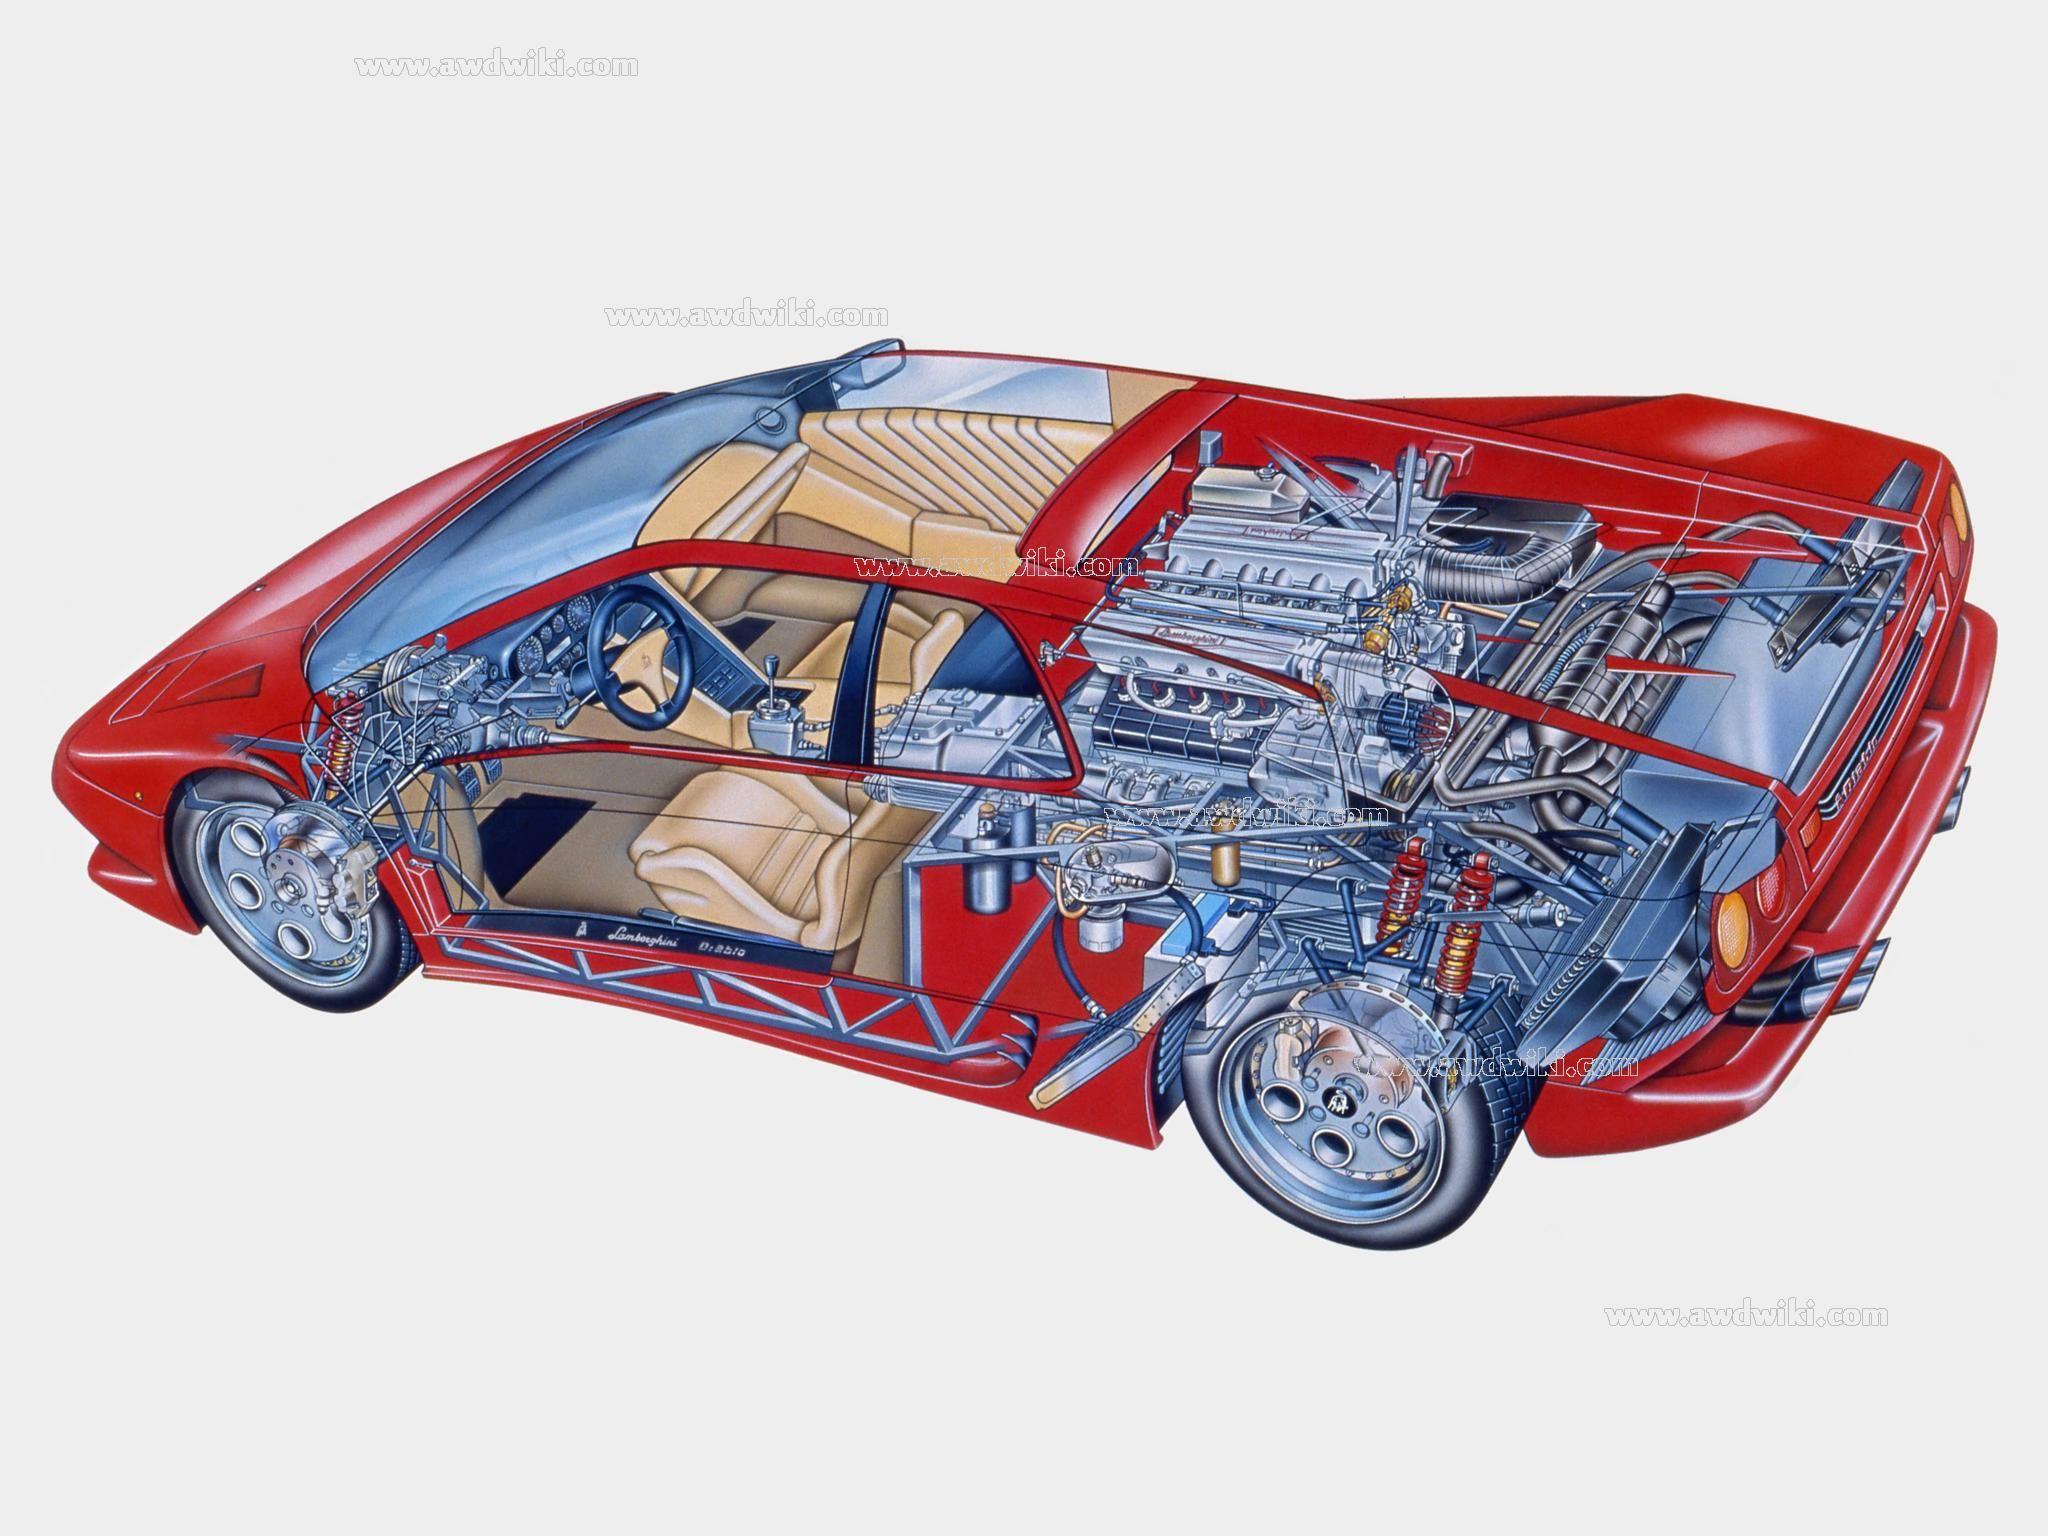 Lamborghini Diablo VT schematics | Lamborghini | Pinterest ...